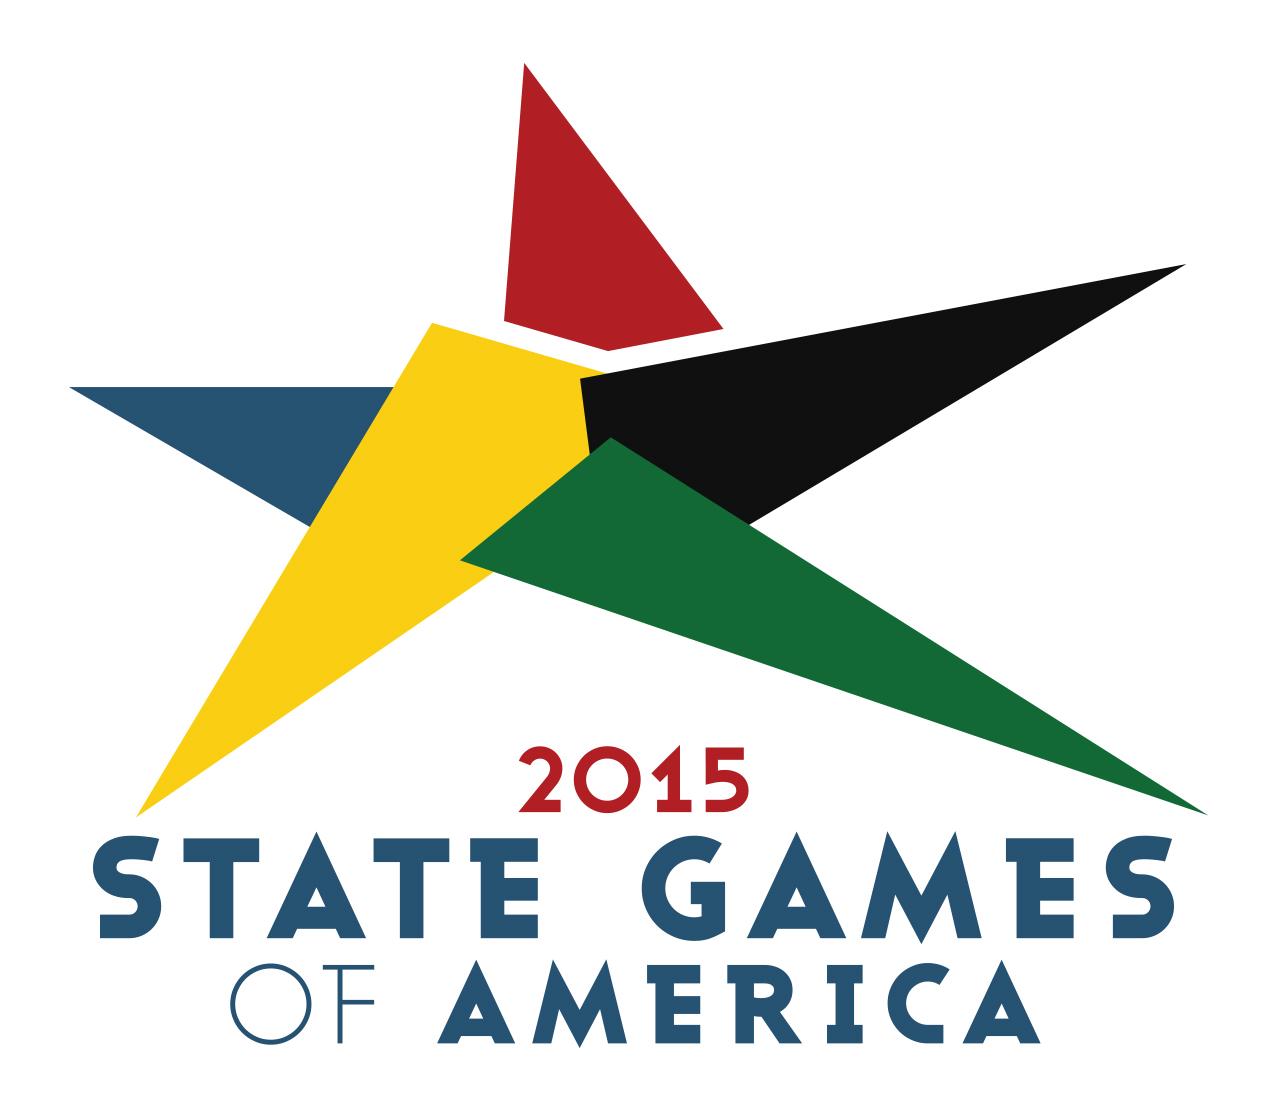 State Games of America 2015 logo